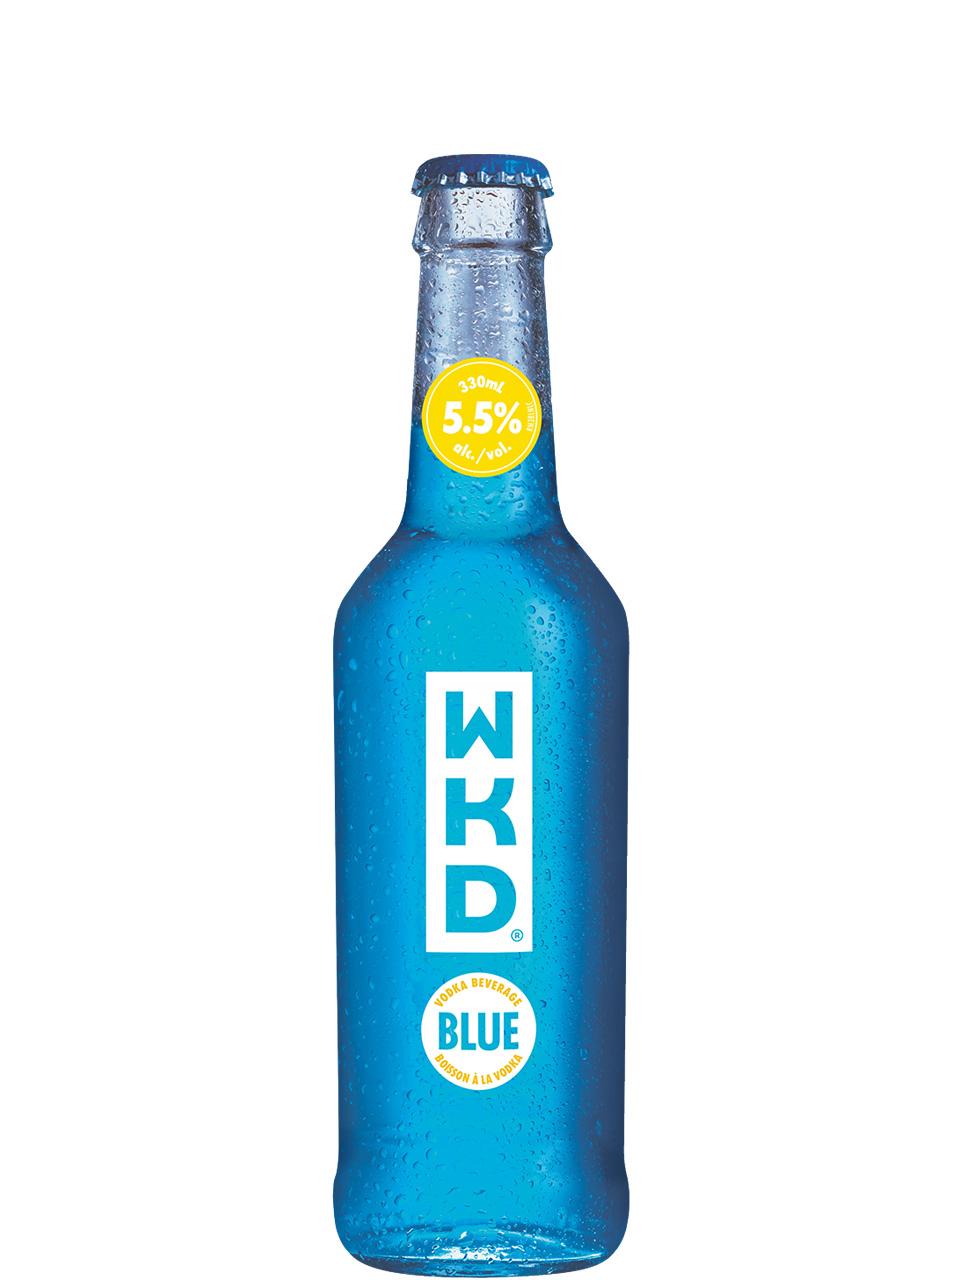 WKD Original Vodka Blue